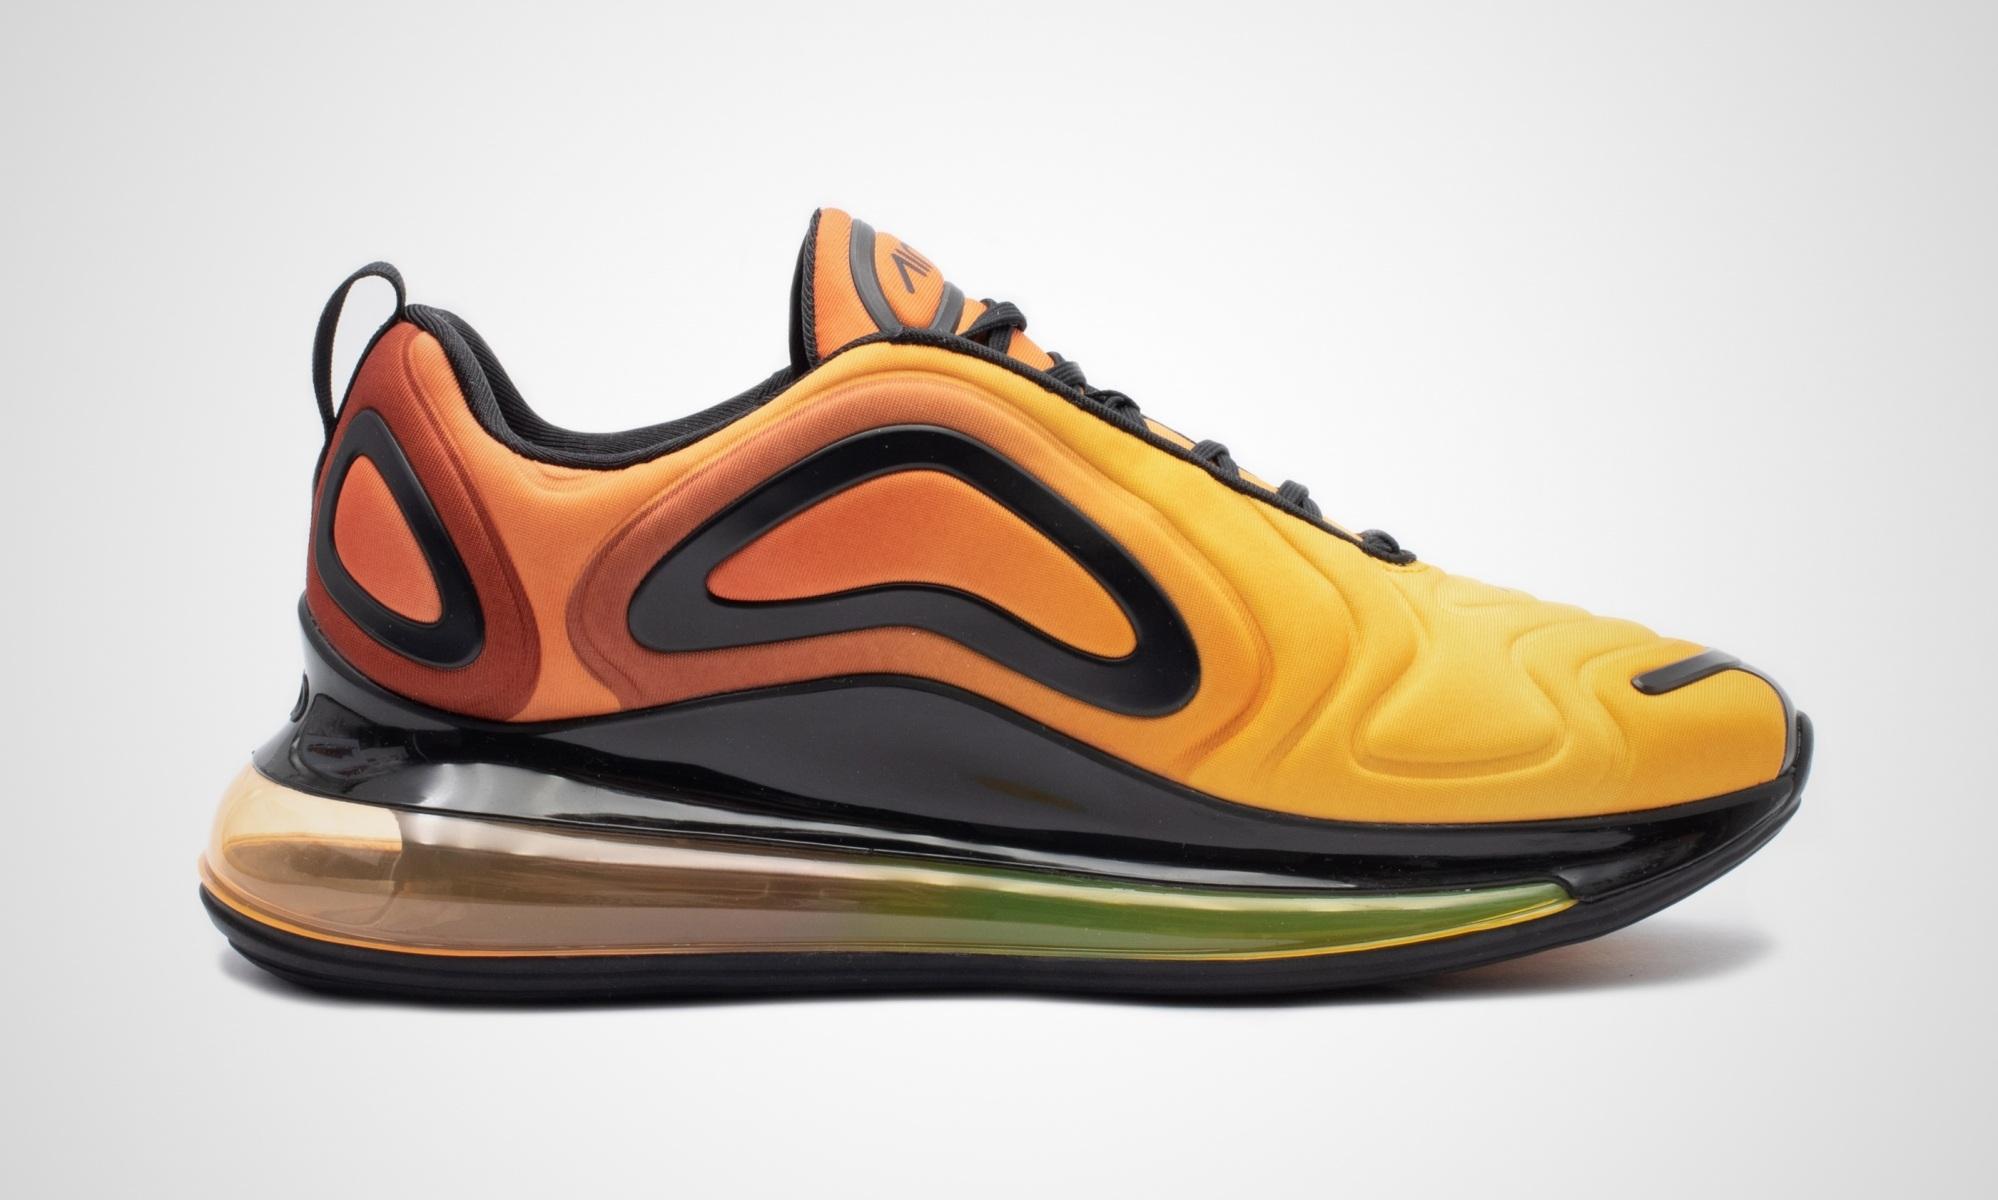 Nike Air Max 720 Sunrise in orange AO2924 800 in 2020